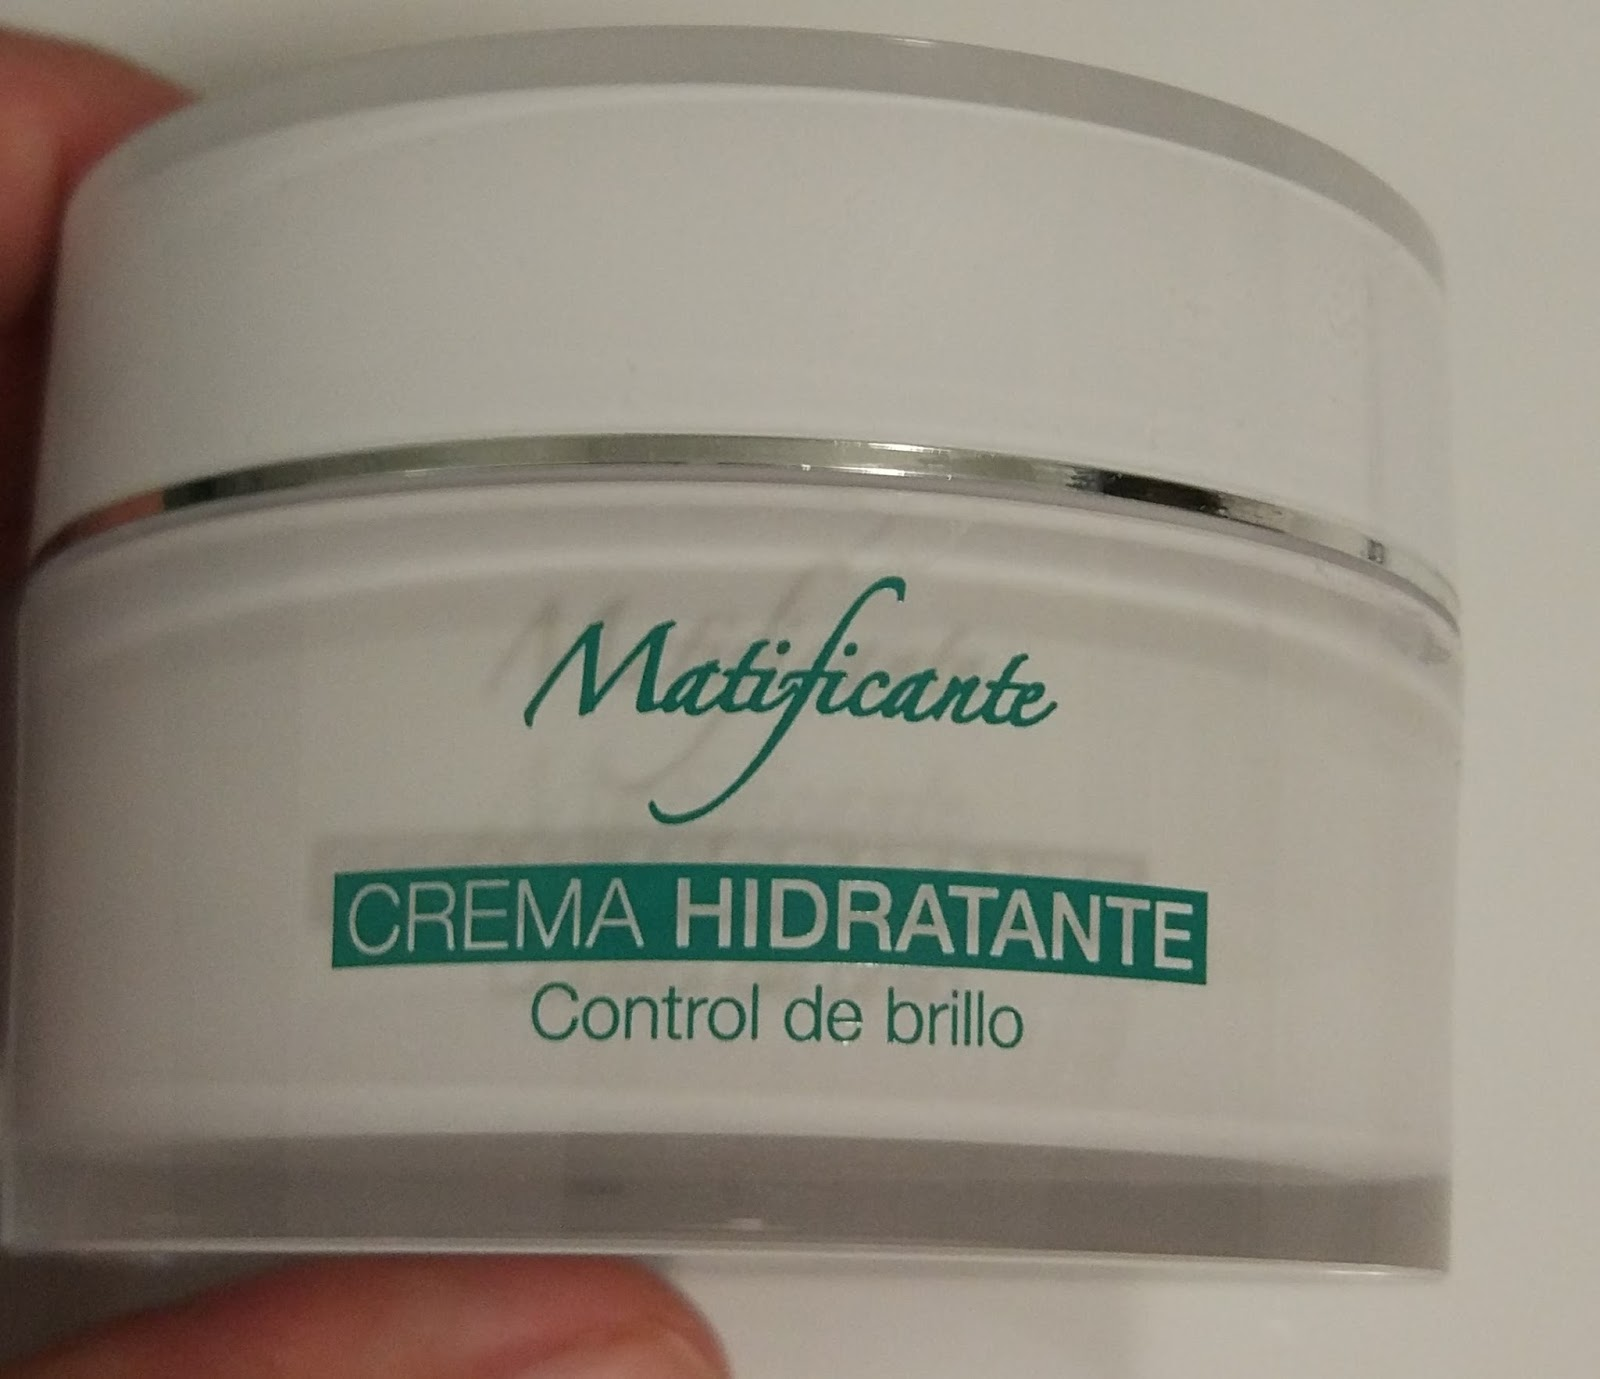 Blog De Vera Review Crema Hidratante Matificante De Mercadona